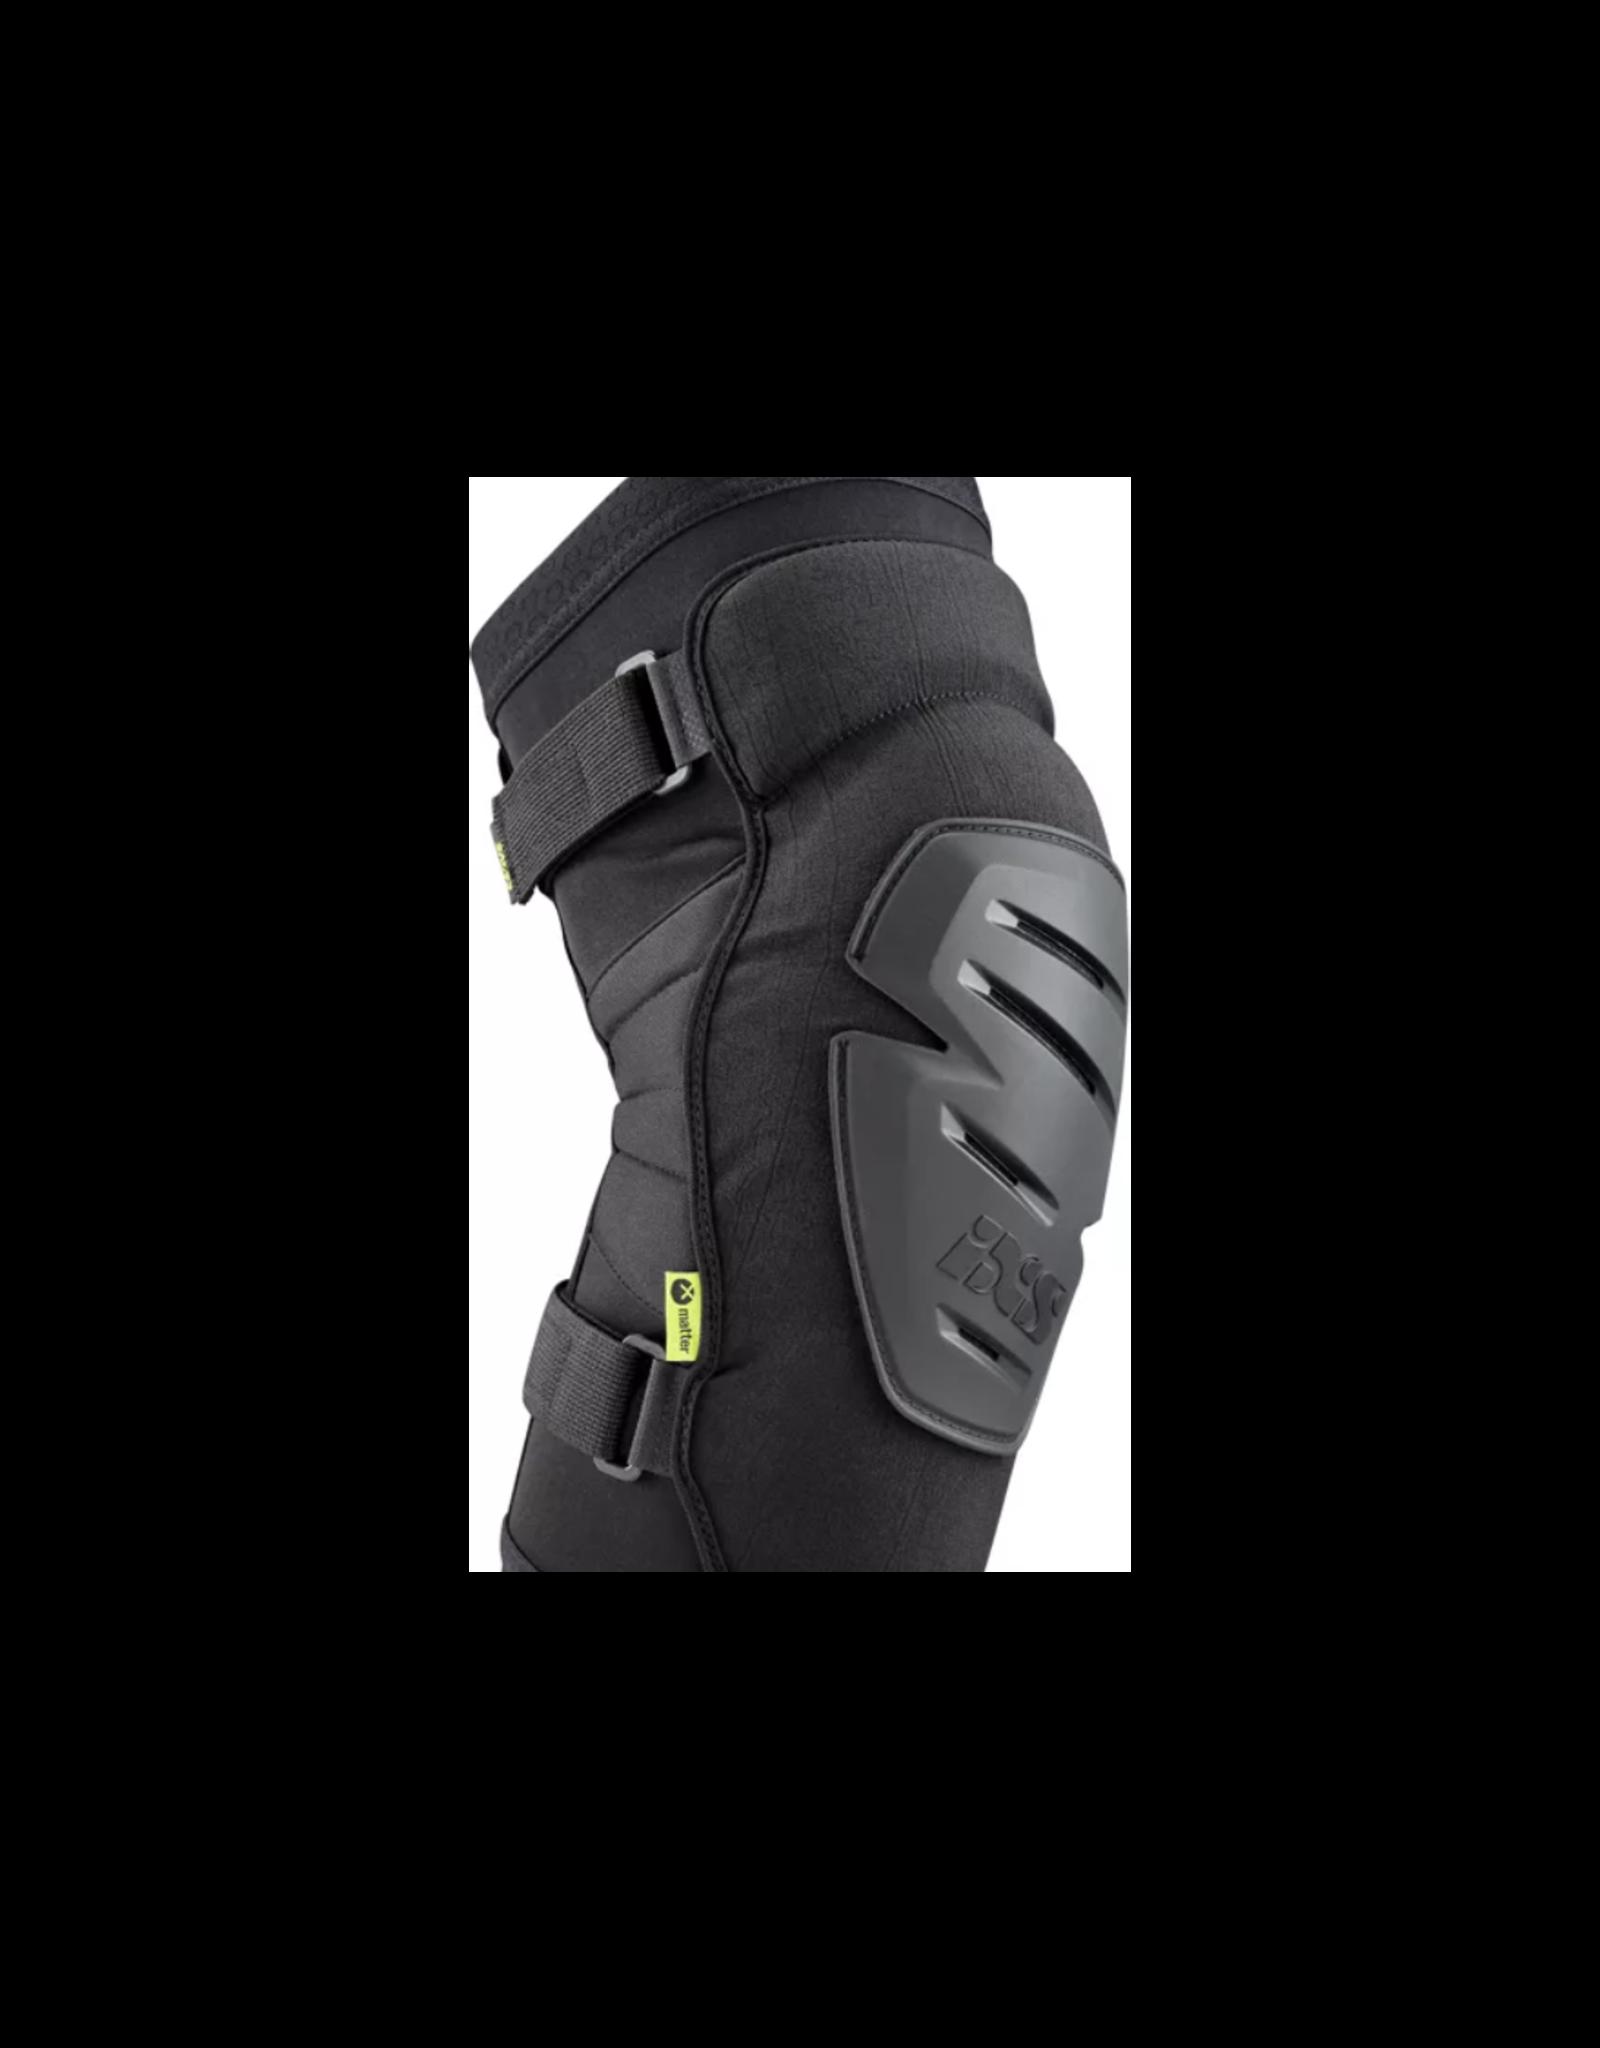 IXS IXS - Carve Race Knee Pad BLK XL